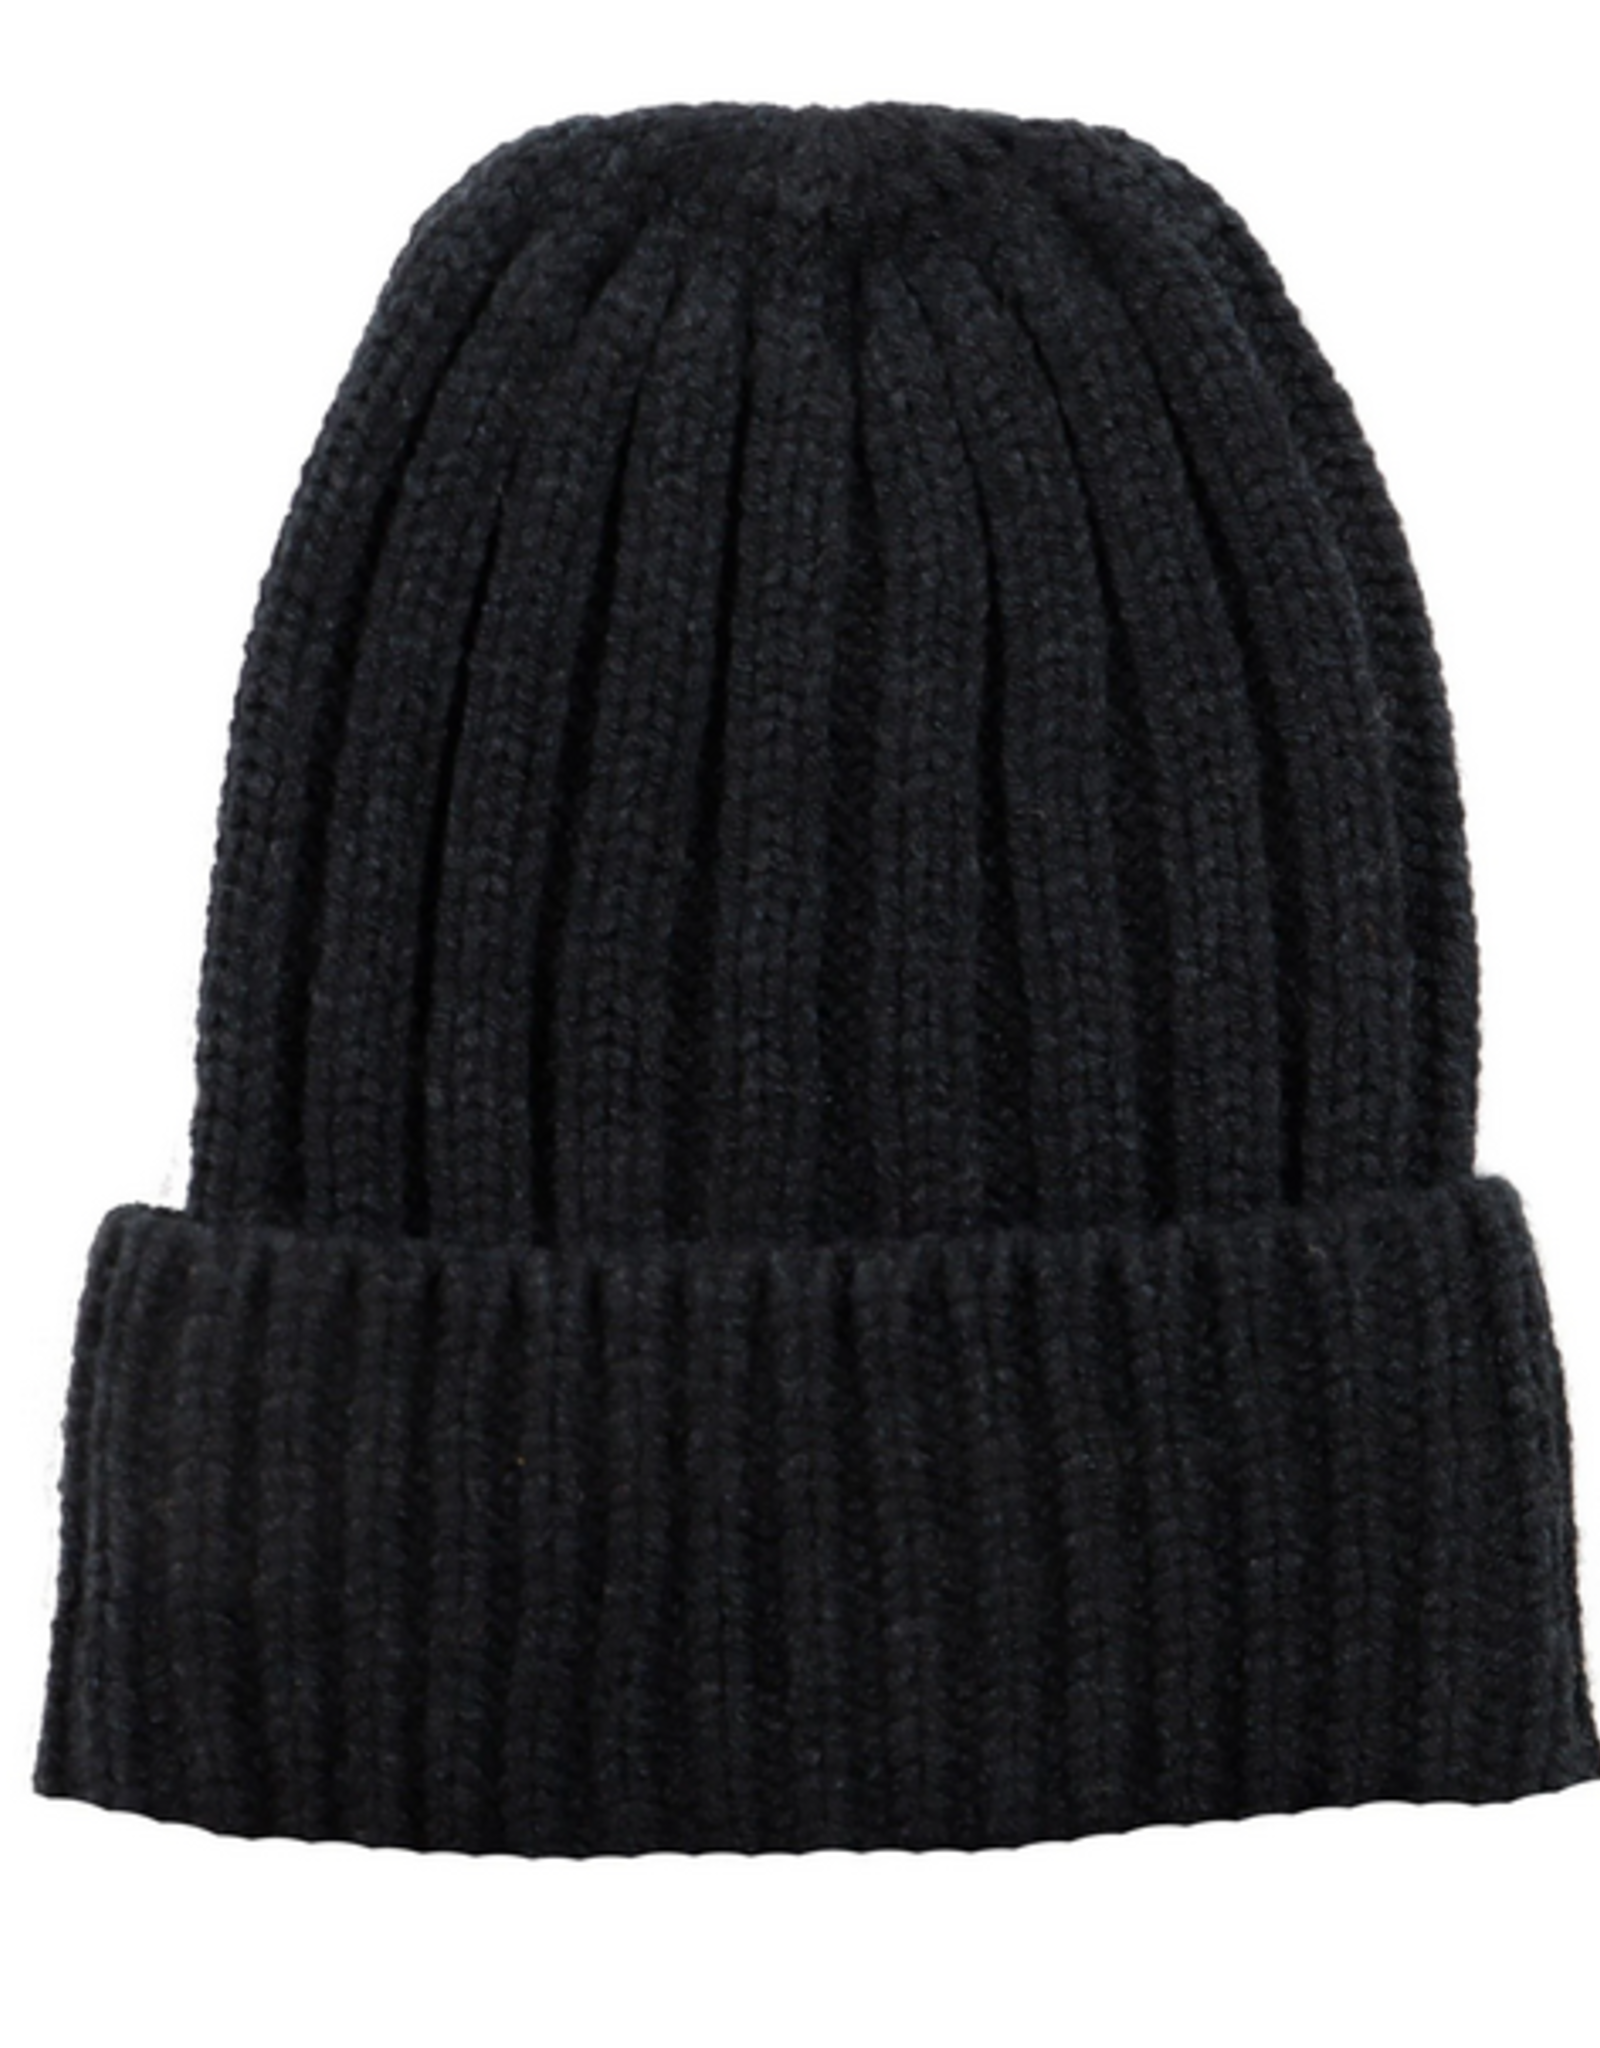 San Diego Hat Co Women's Black Cuffed Beanie